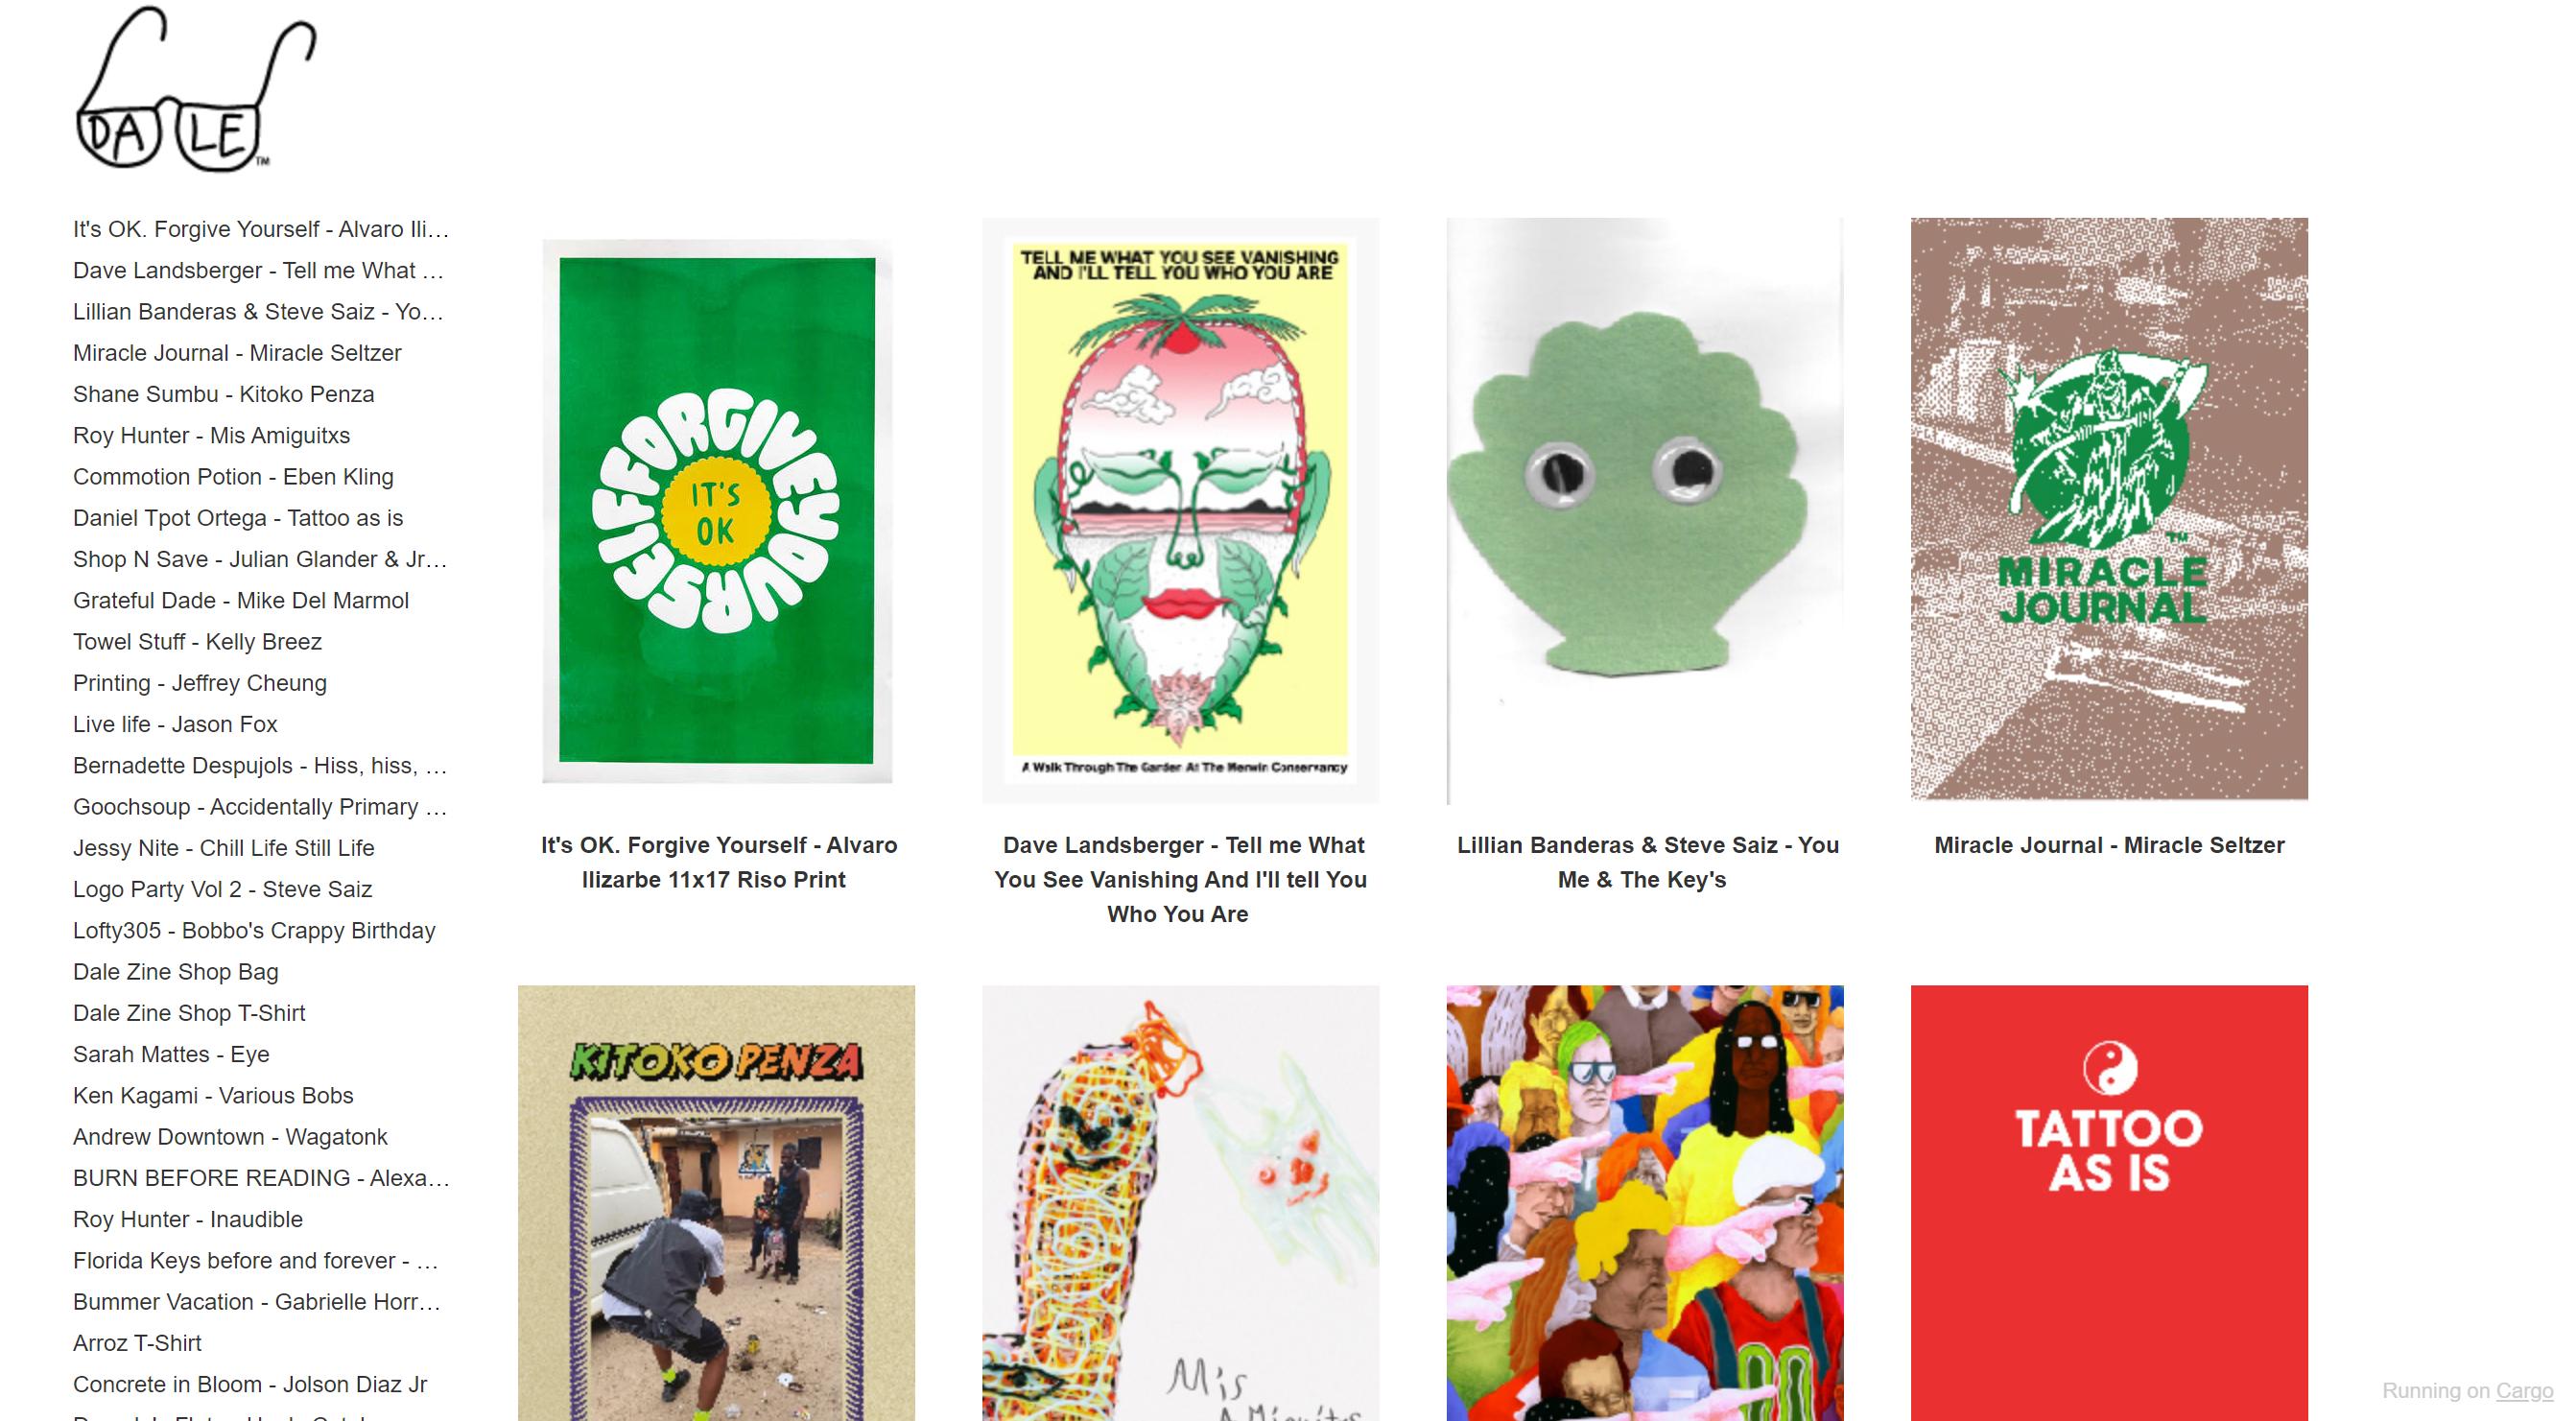 Dale Zine's online catalog